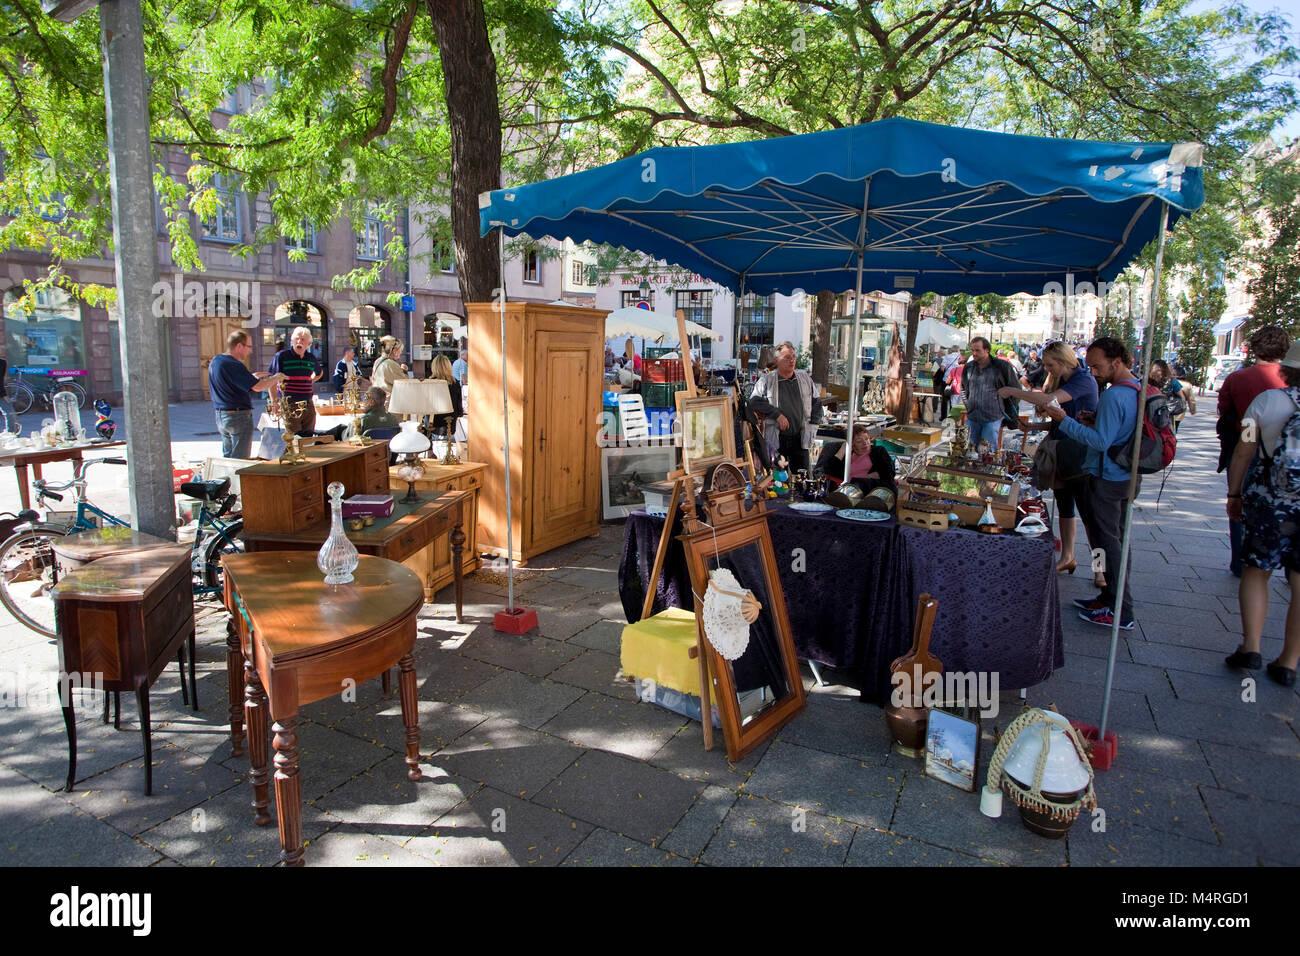 Flea market at Rue du Vieil Hopital, Strasbourg, Alsace, Bas-Rhin, France, Europe - Stock Image